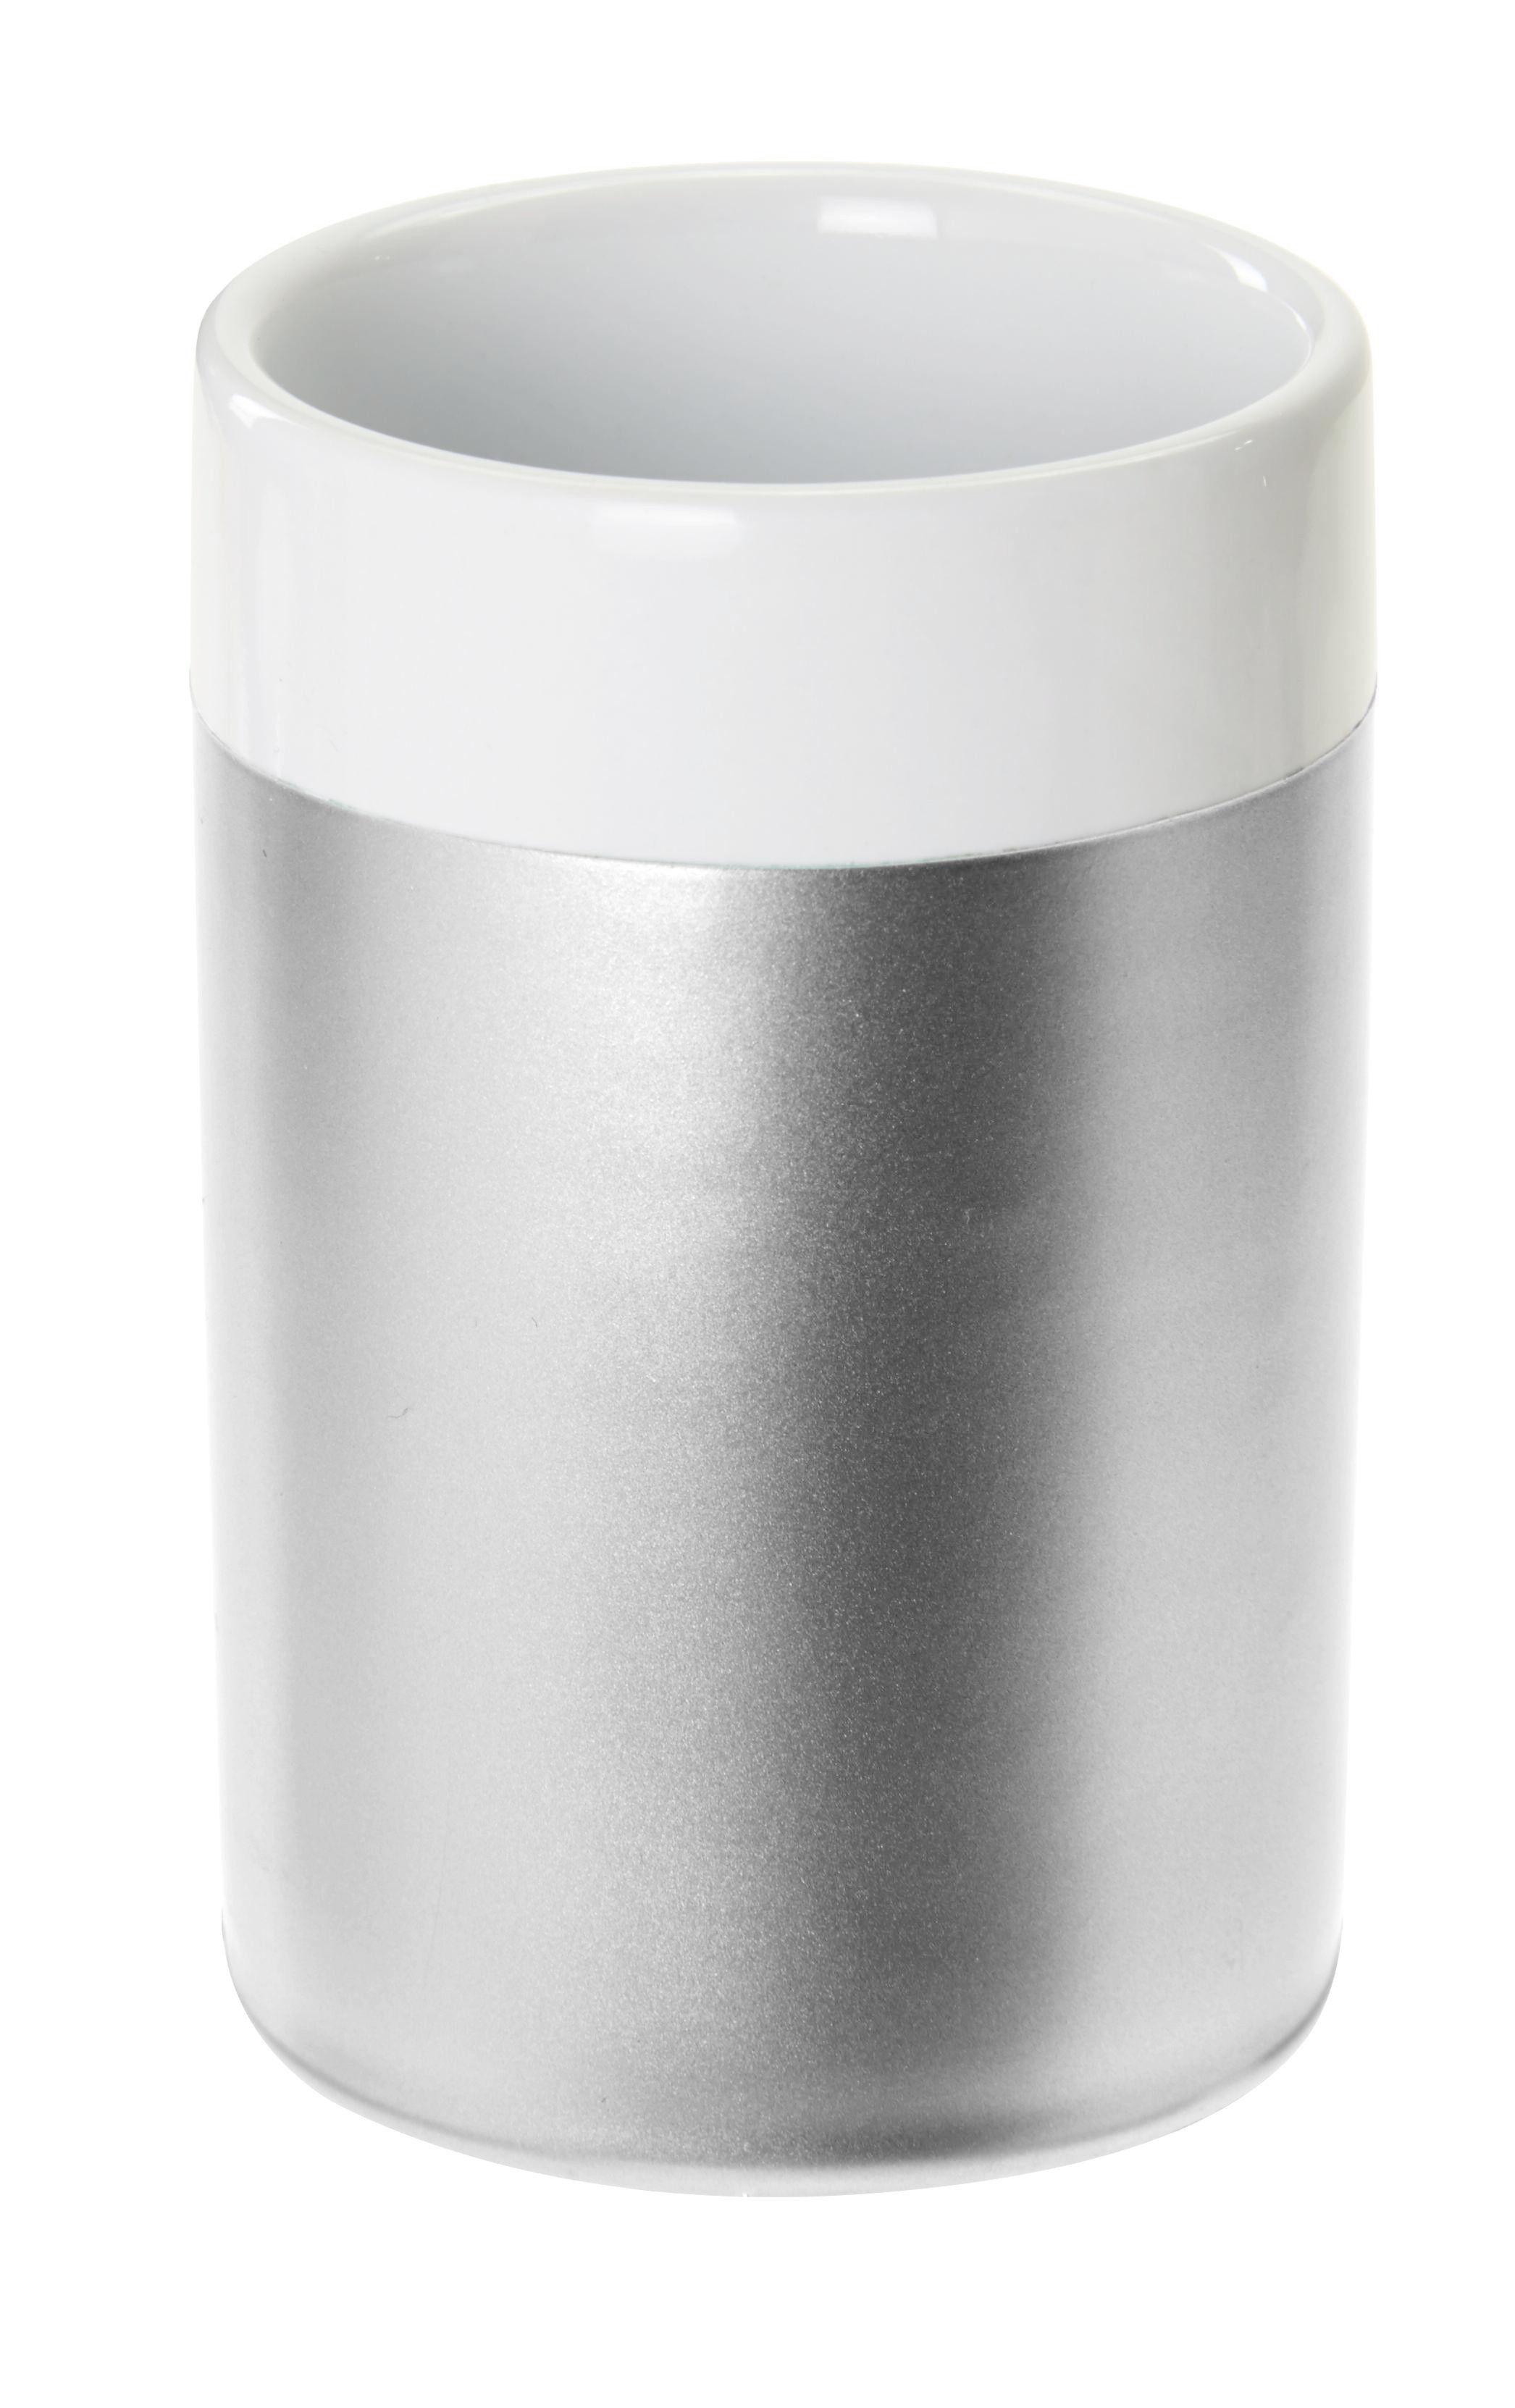 KUPAONSKA ČAŠA - antracit, Basics, keramika (6.5/10/6.5cm) - Celina